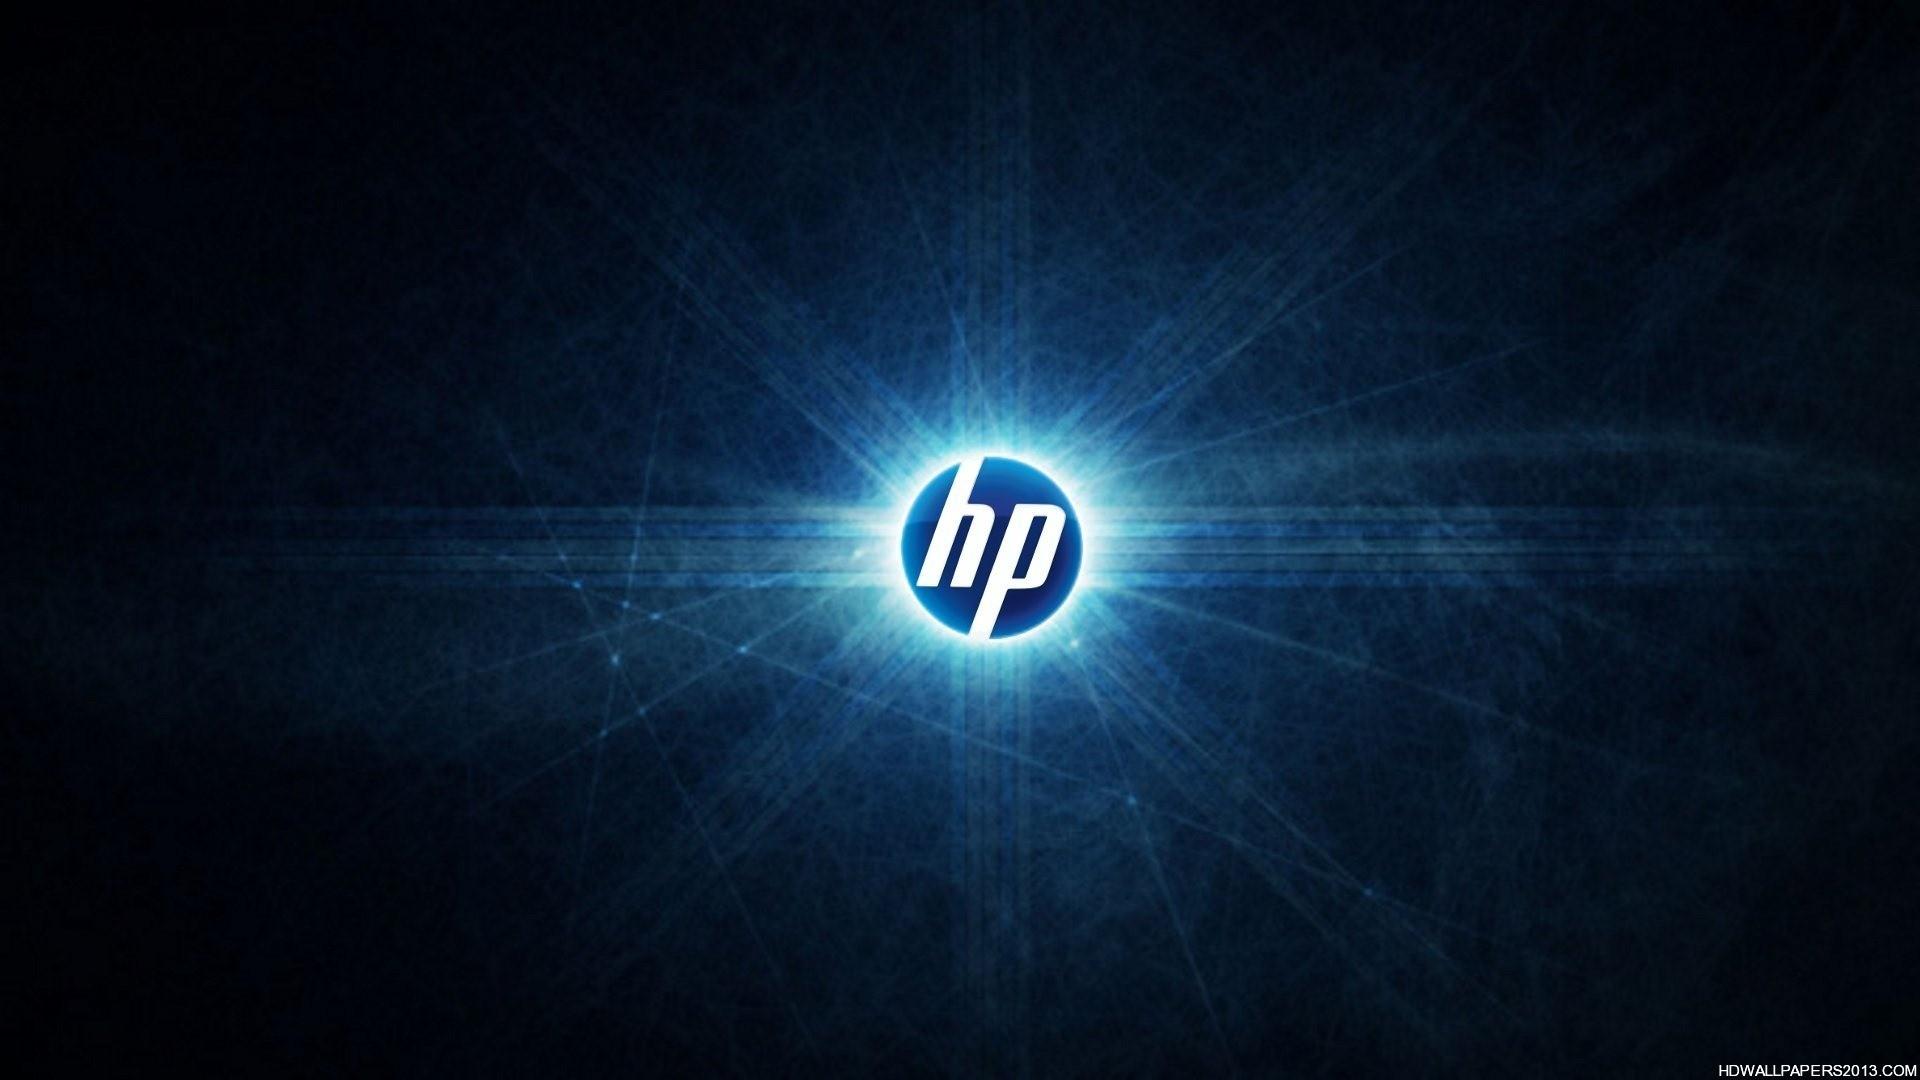 HP Wallpaper HD